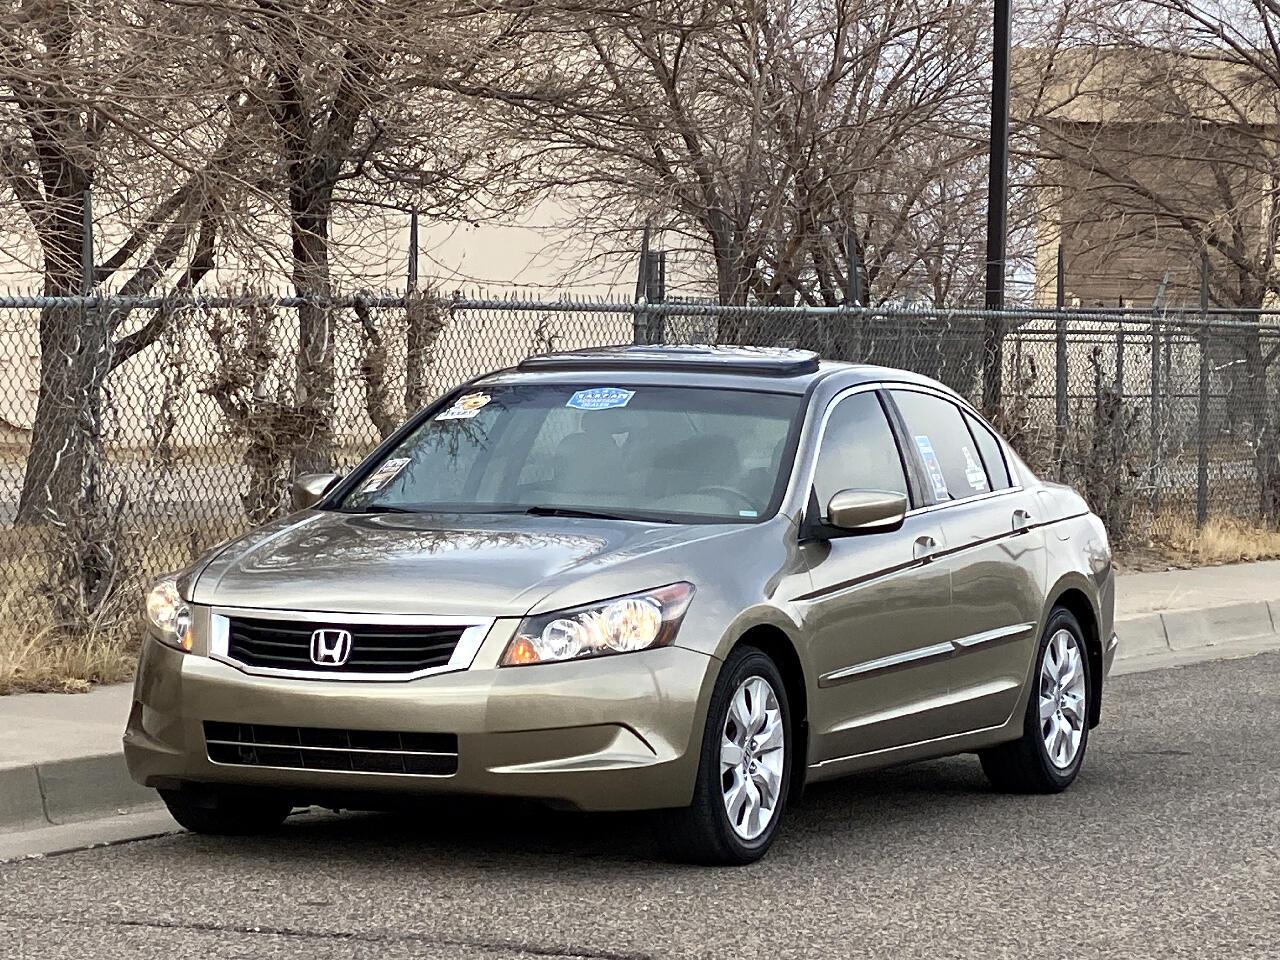 2008 Honda Accord Sdn 4dr I4 Auto EX-L